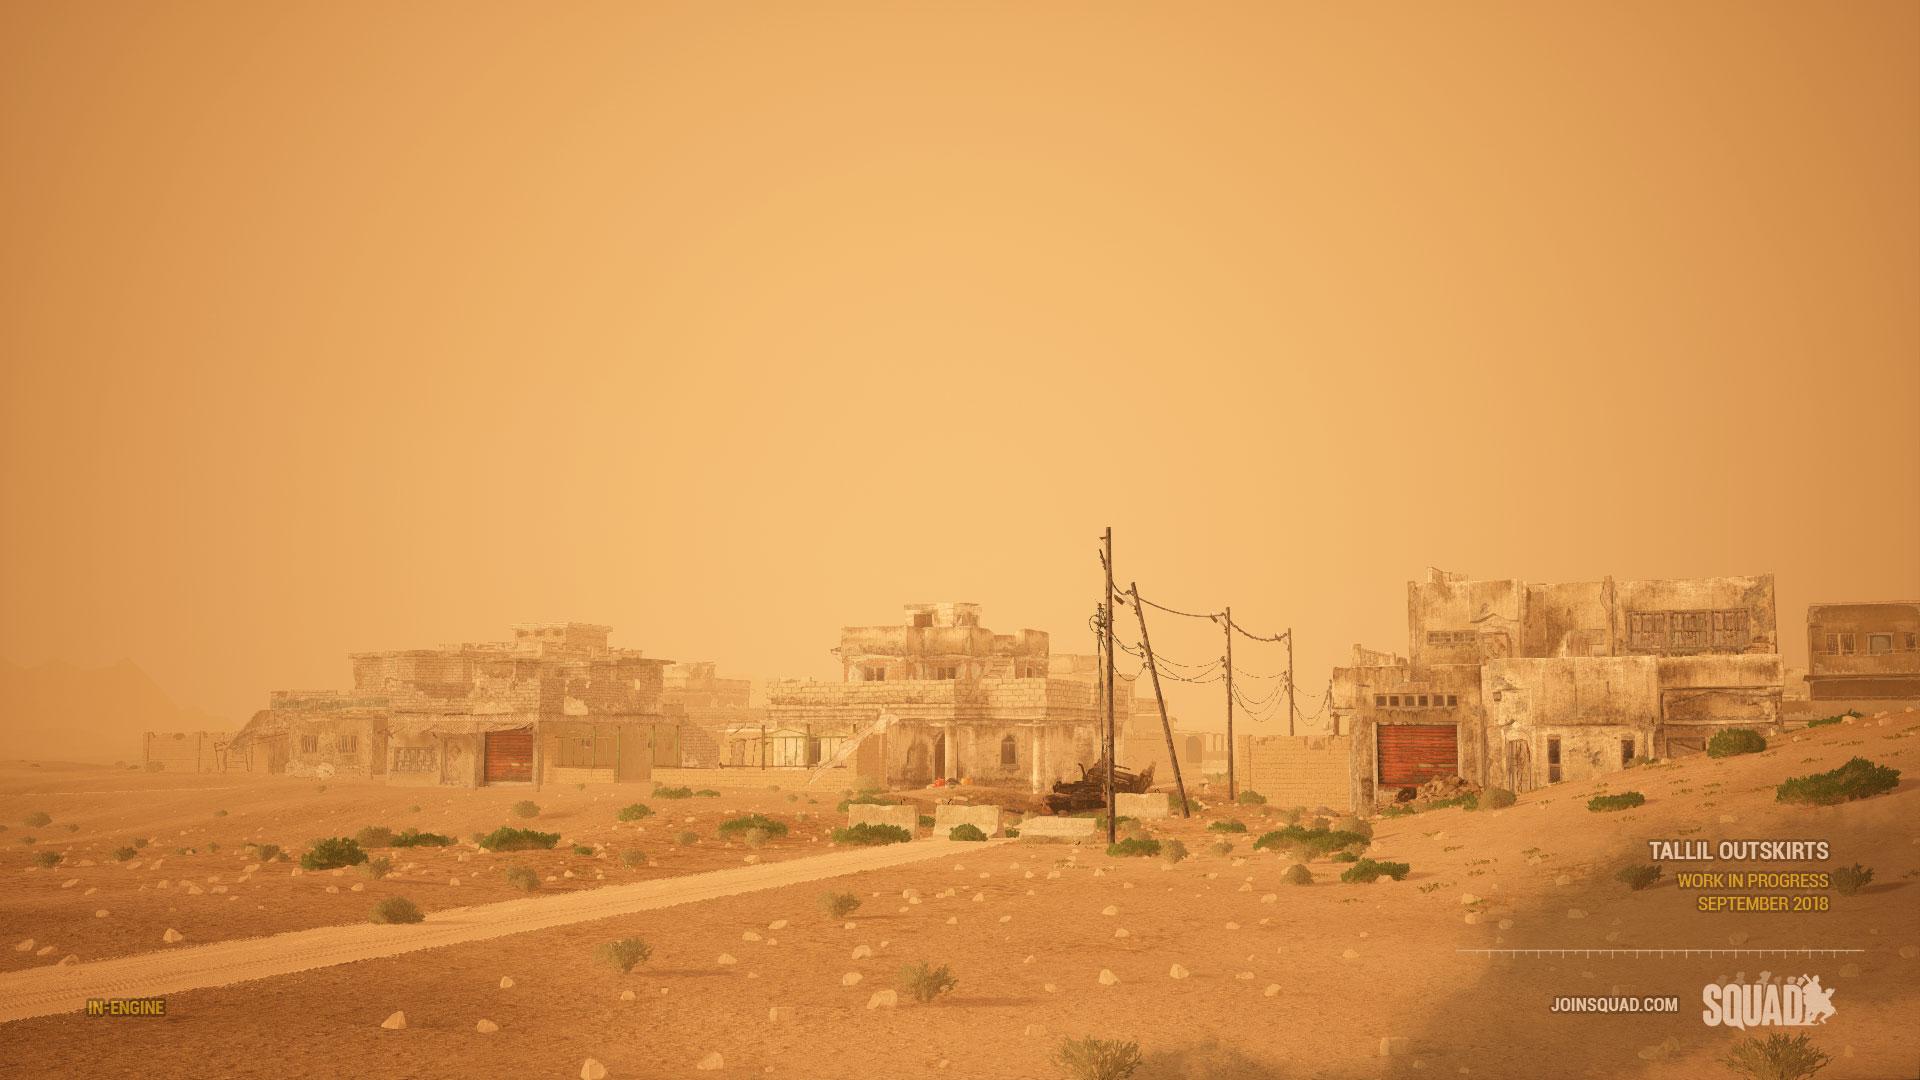 tallil_sandstorm_1.jpg